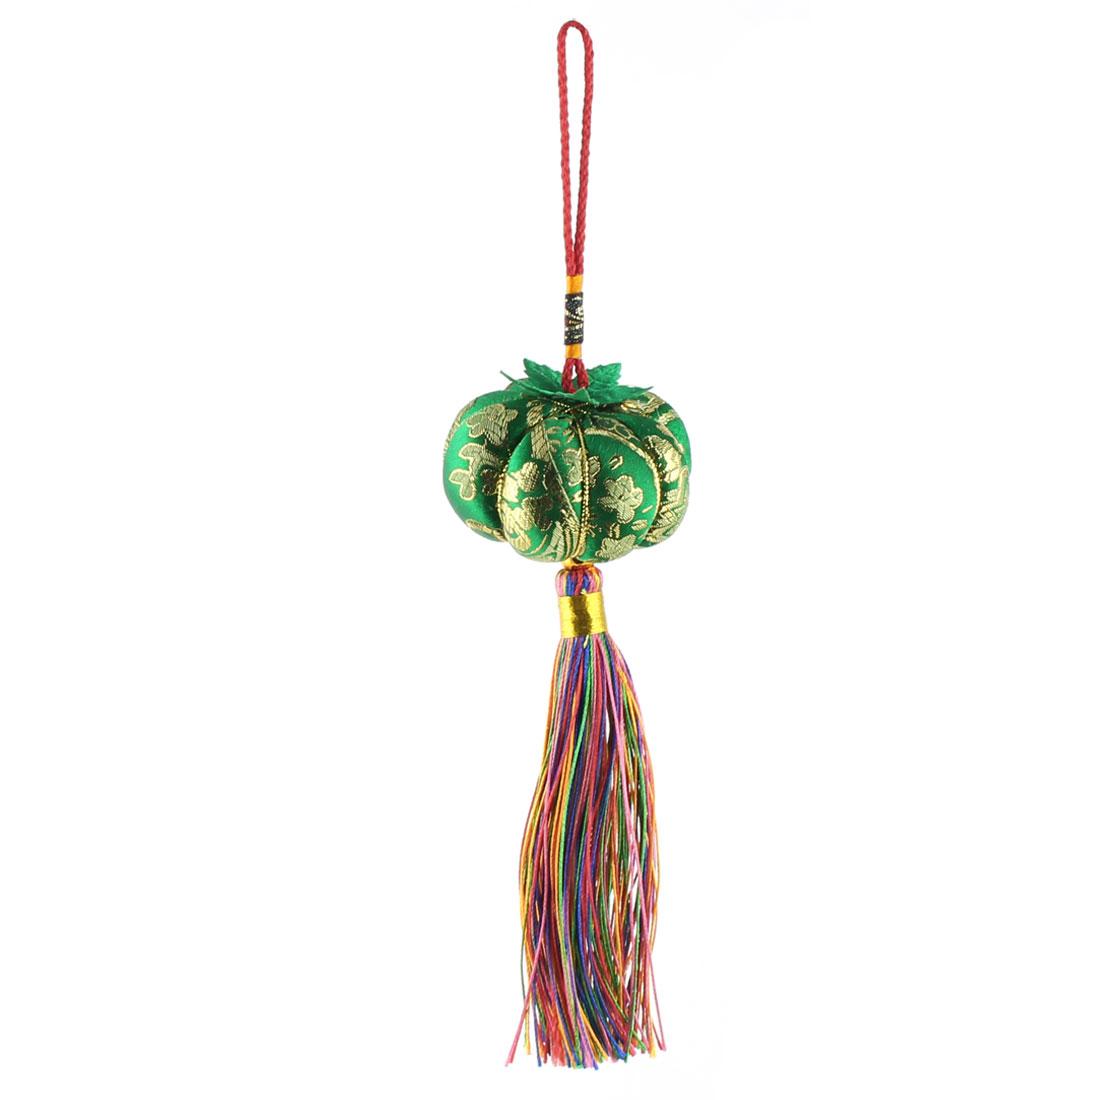 Cotton Rope Pumpkin Shape Handmade Woven Hanging Tassel Chinese Knot Green